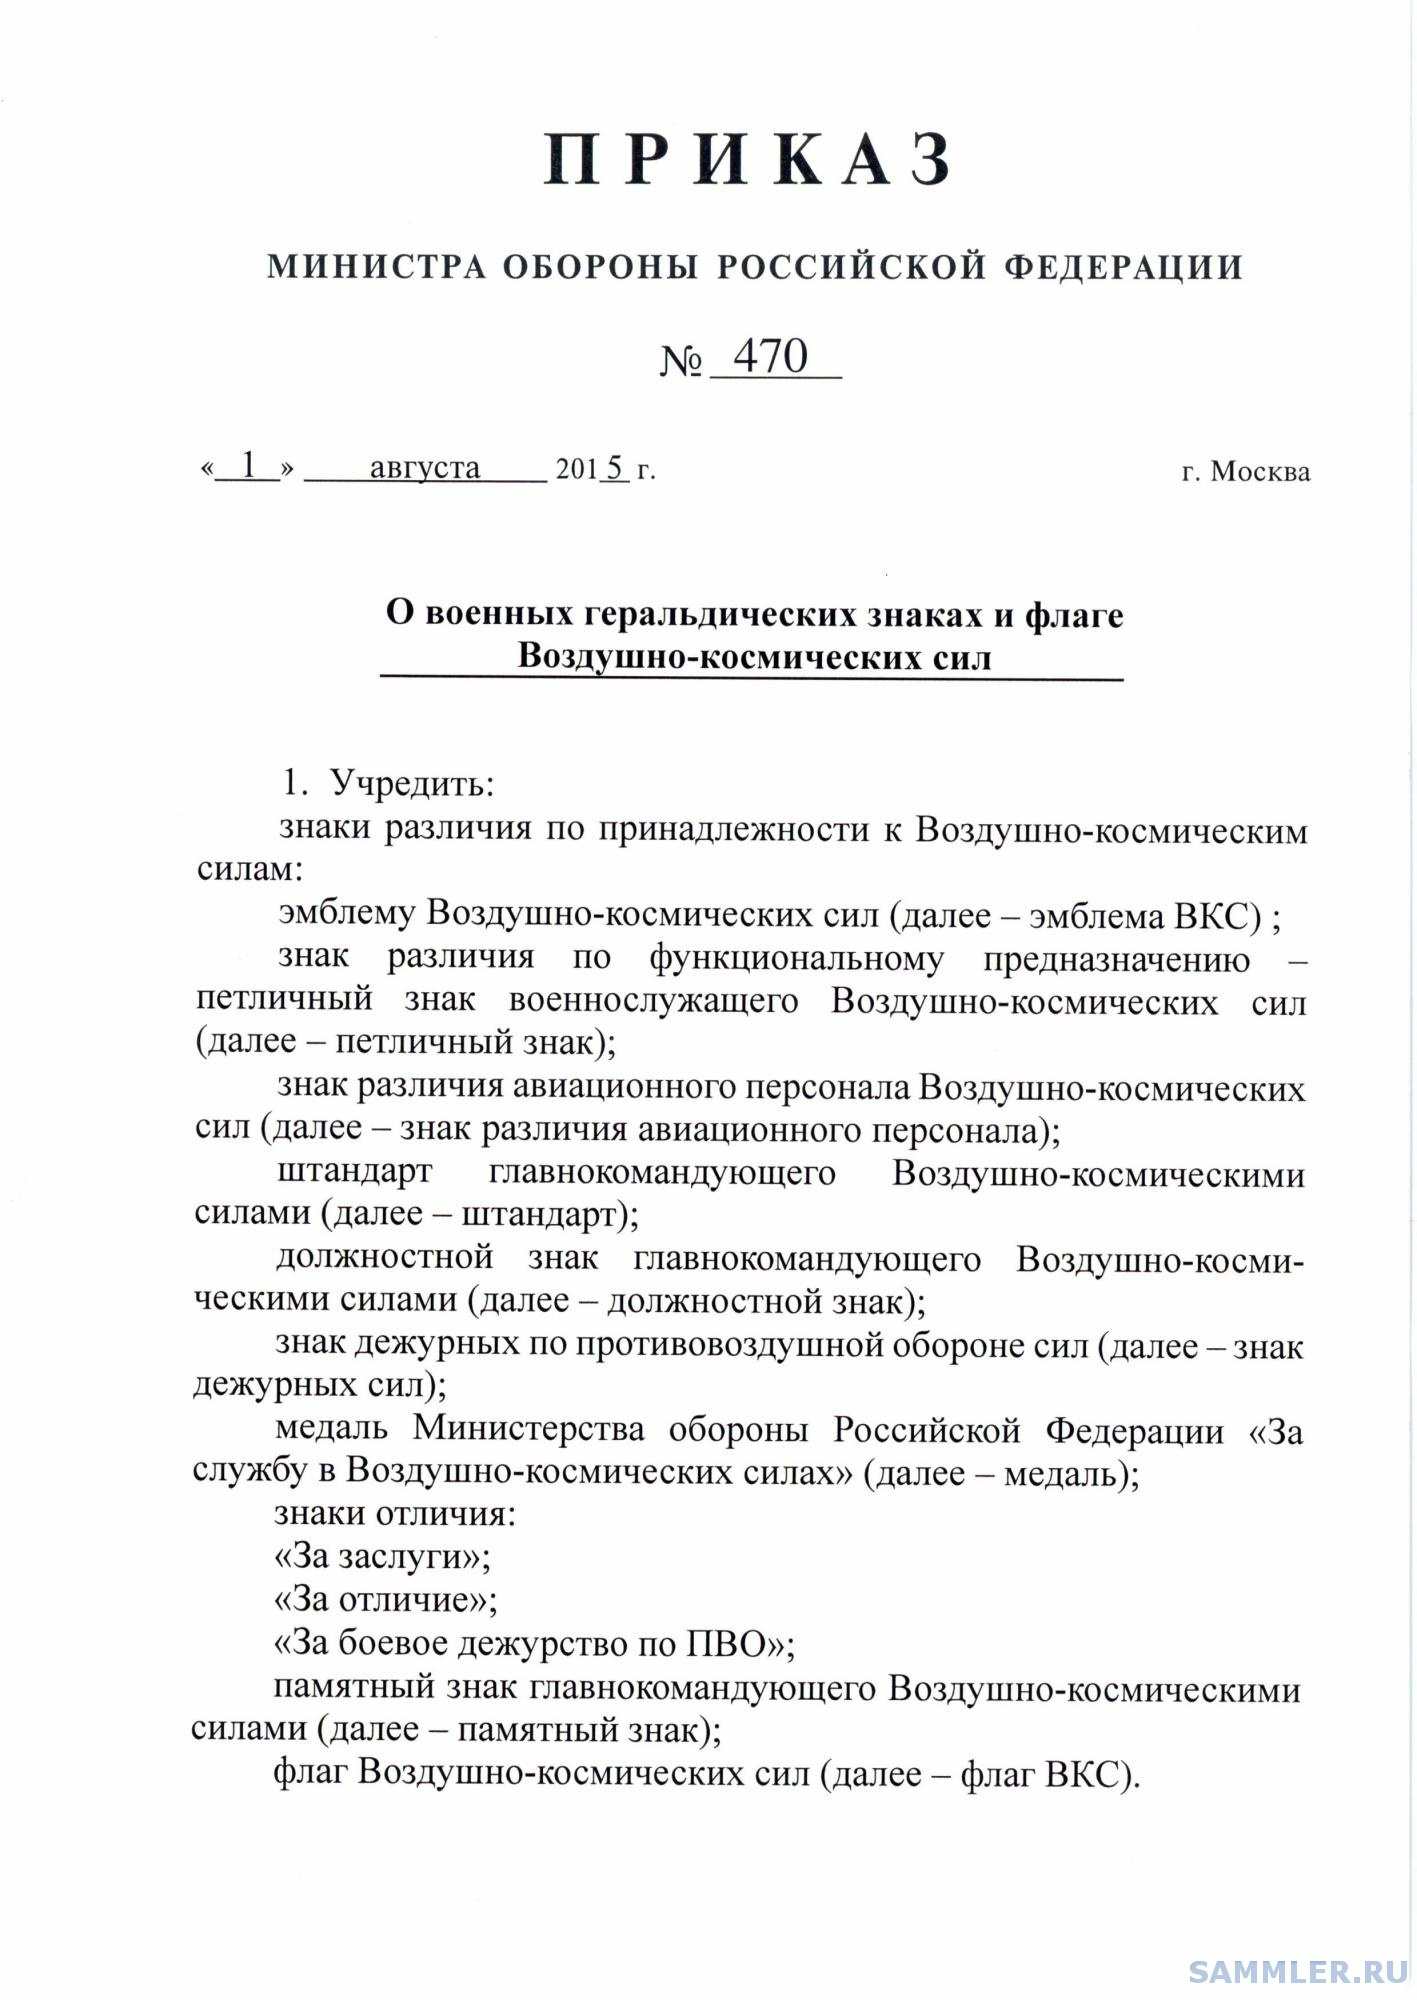 МО РФ 470(цвет)-1.jpg